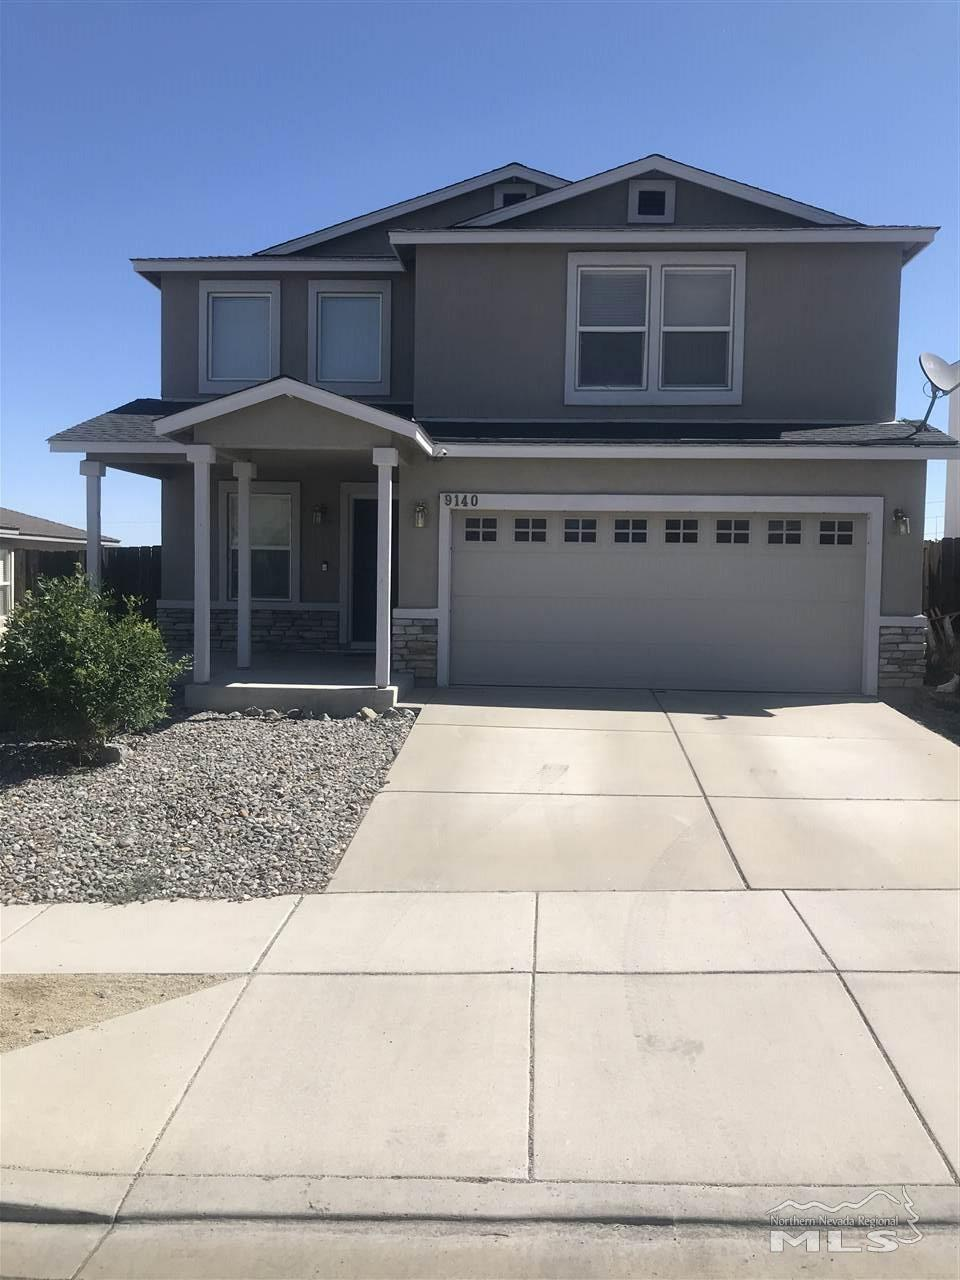 Image for 9140 Red Baron Blvd, Reno, NV 89506